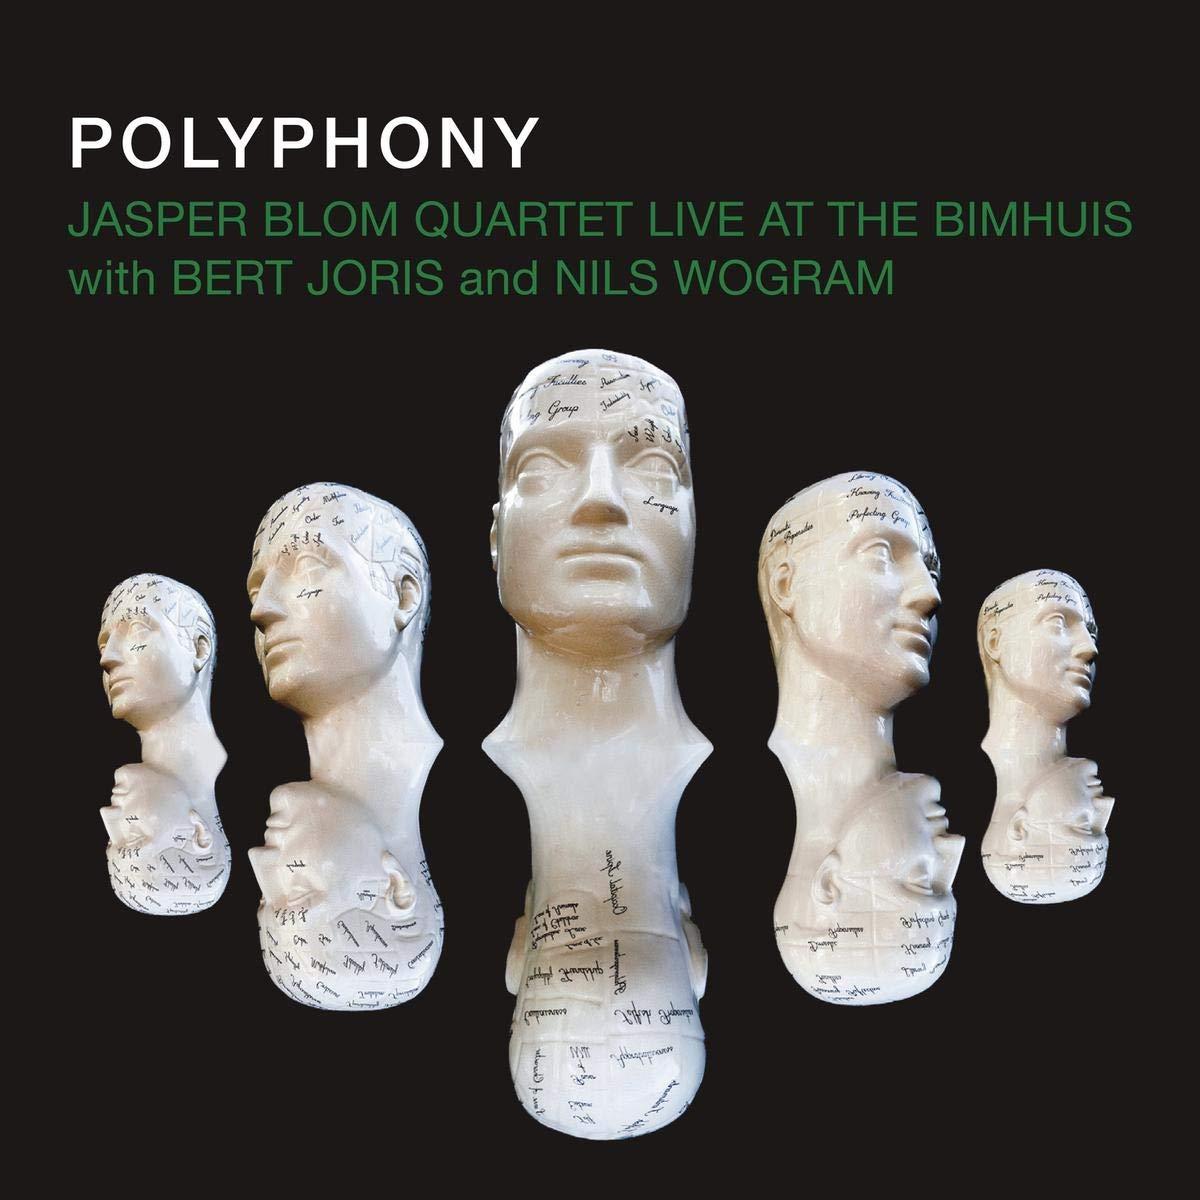 Vinilo : Jasper Blom Quartet - Polyphony (LP Vinyl)